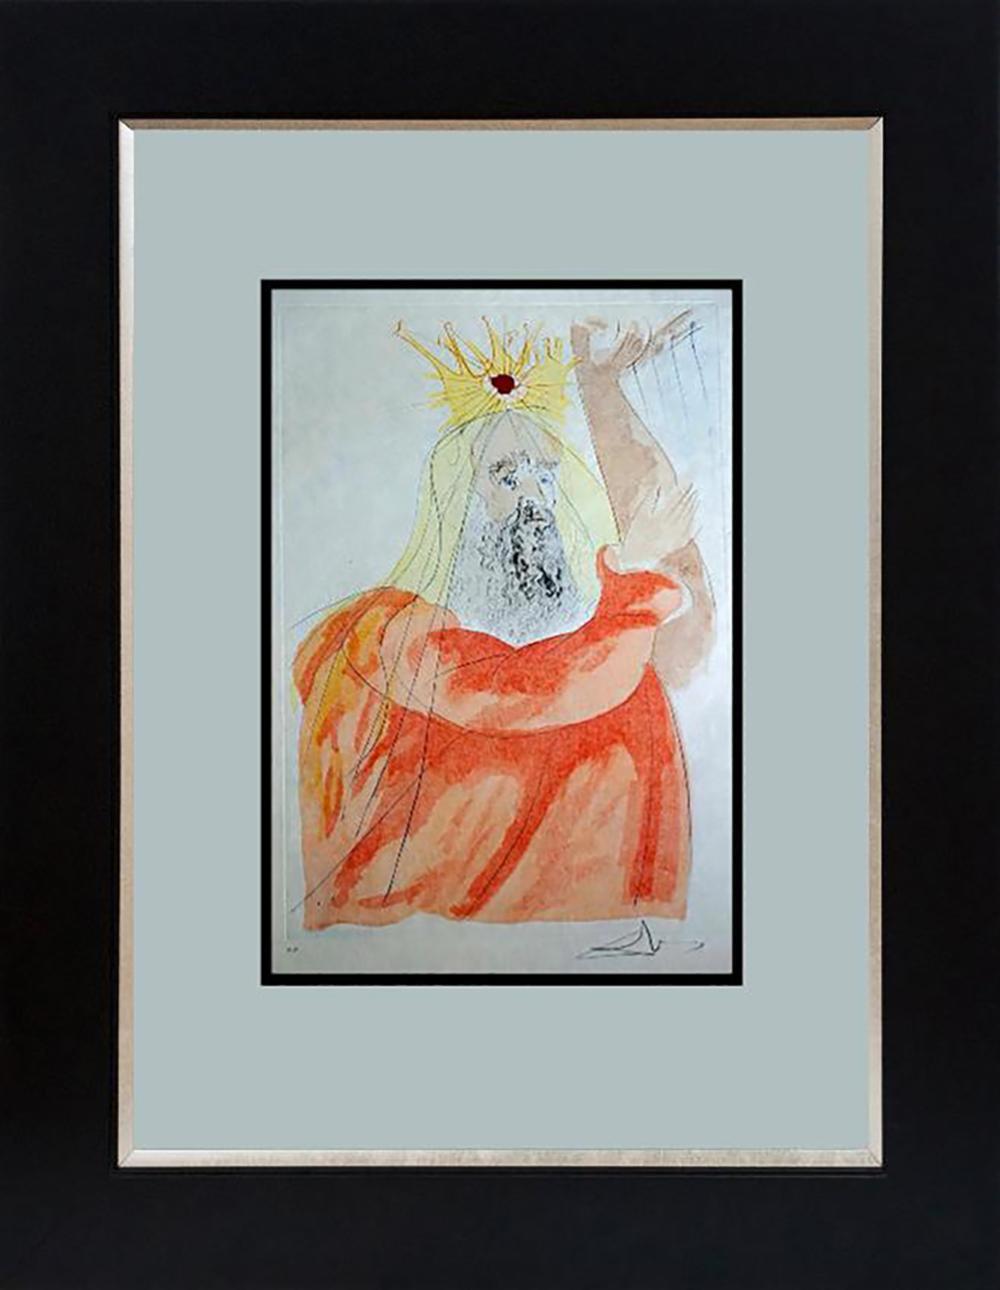 Salvador Dali King David Lithograph Limited Edition